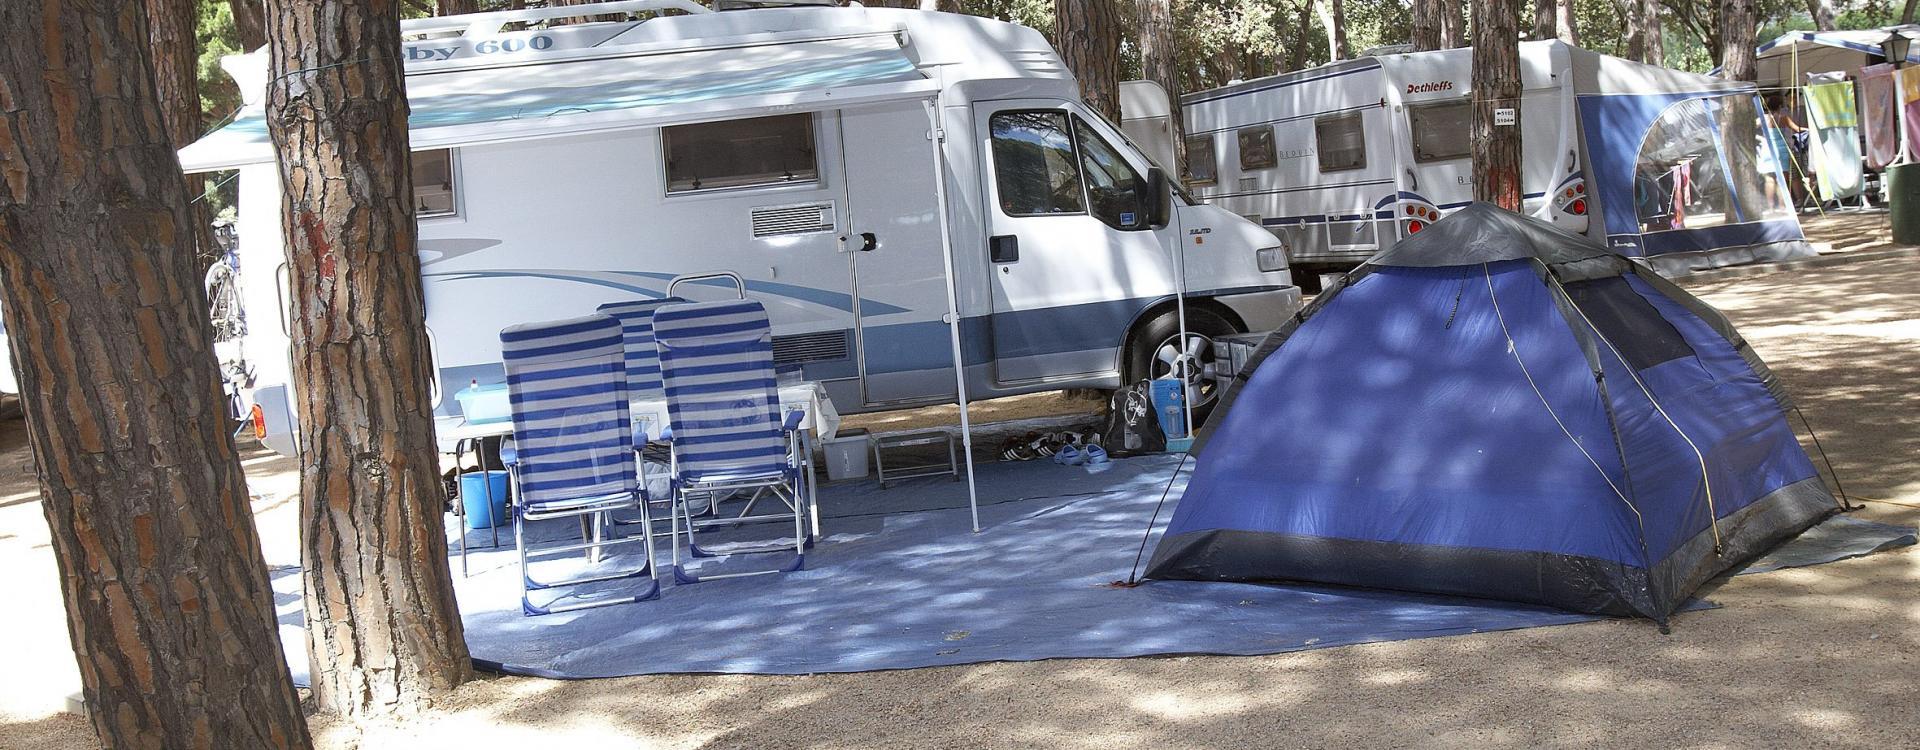 Caravana i tenda de campanya